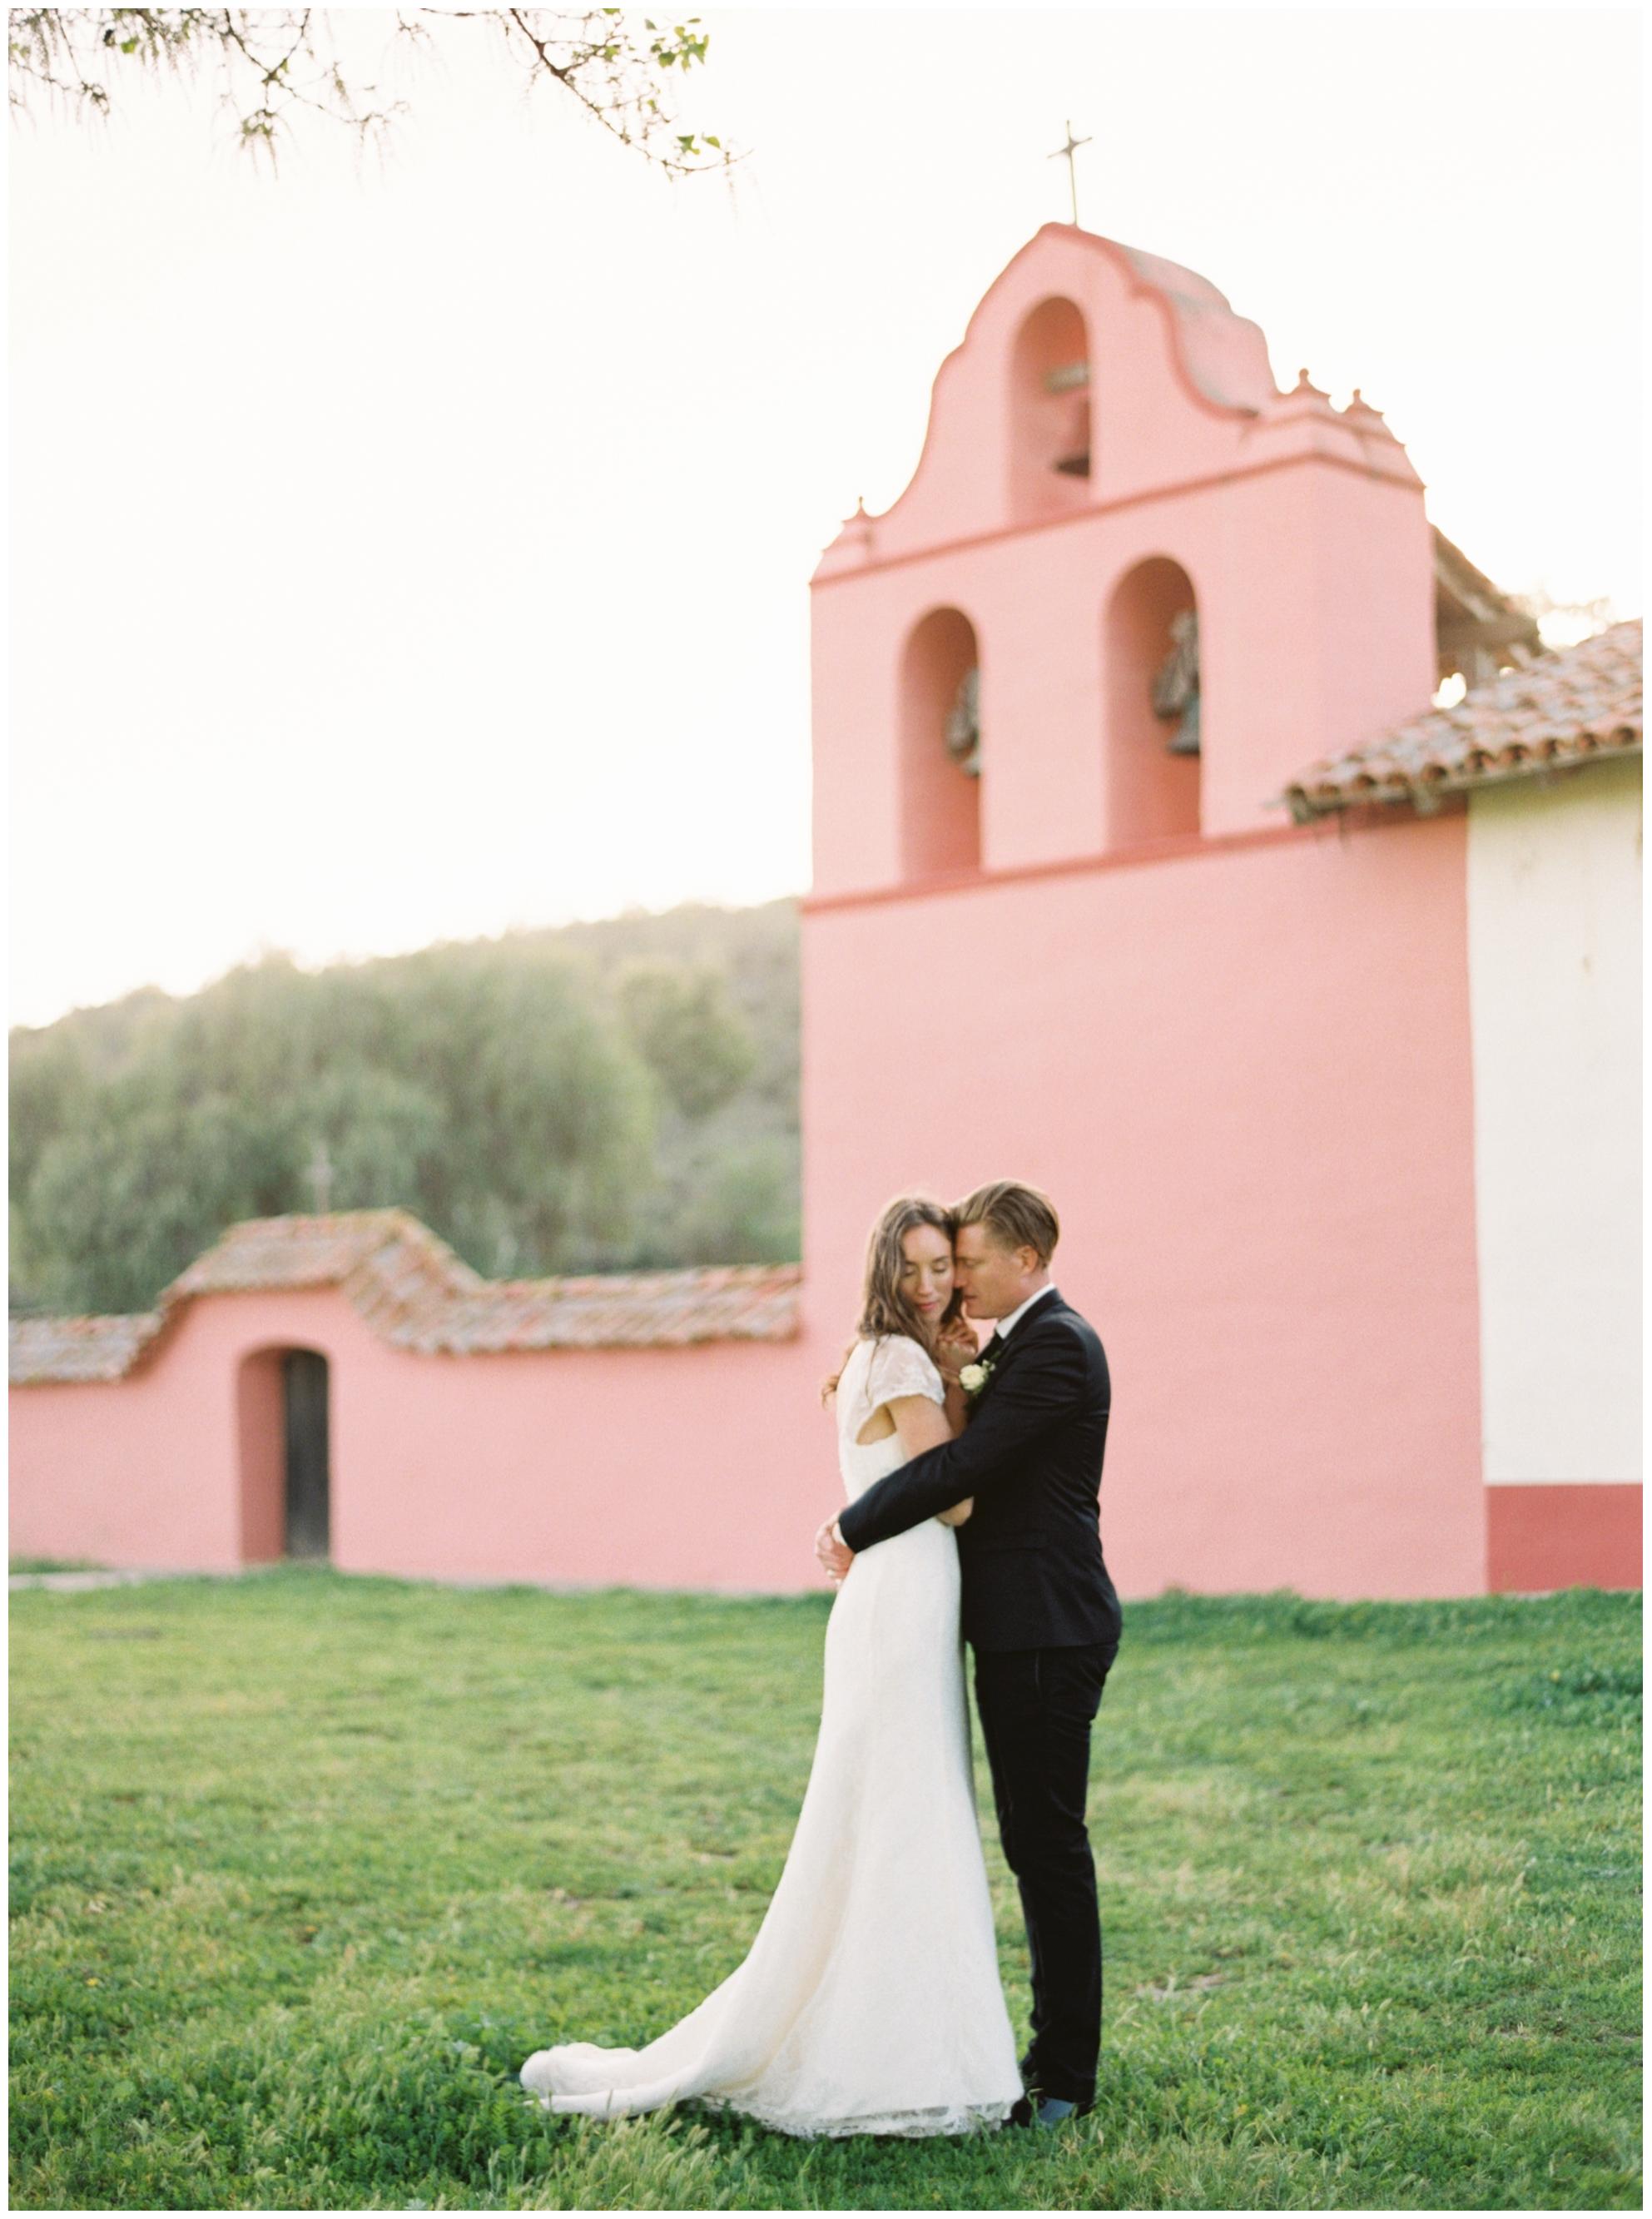 Santa_Barbara_Wedding_Photographer_Pinnel_Photography_La_Purisima_Mission-053.jpg